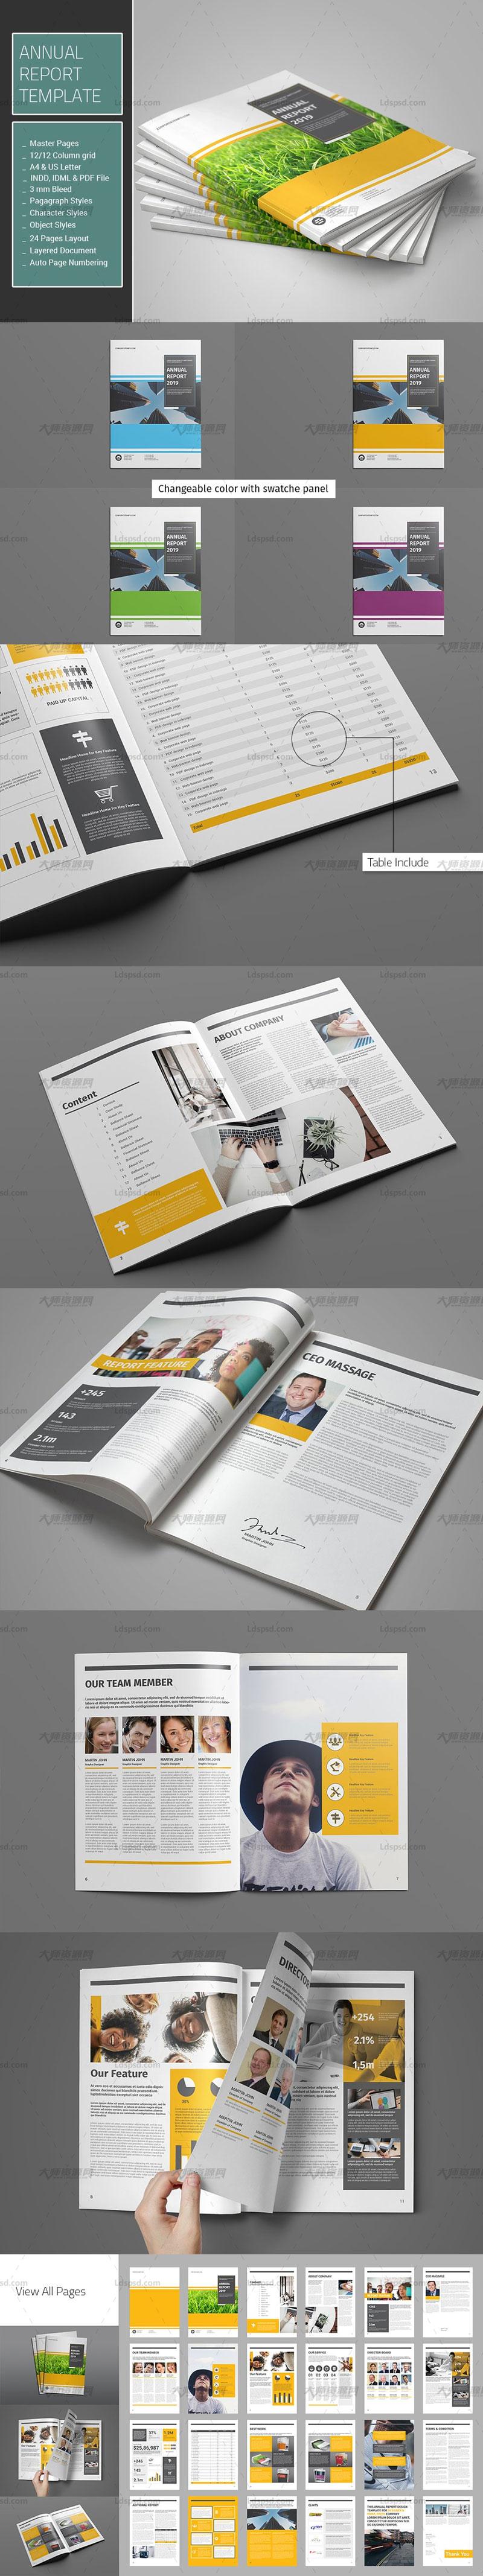 Annual Report Template 2876695.jpg